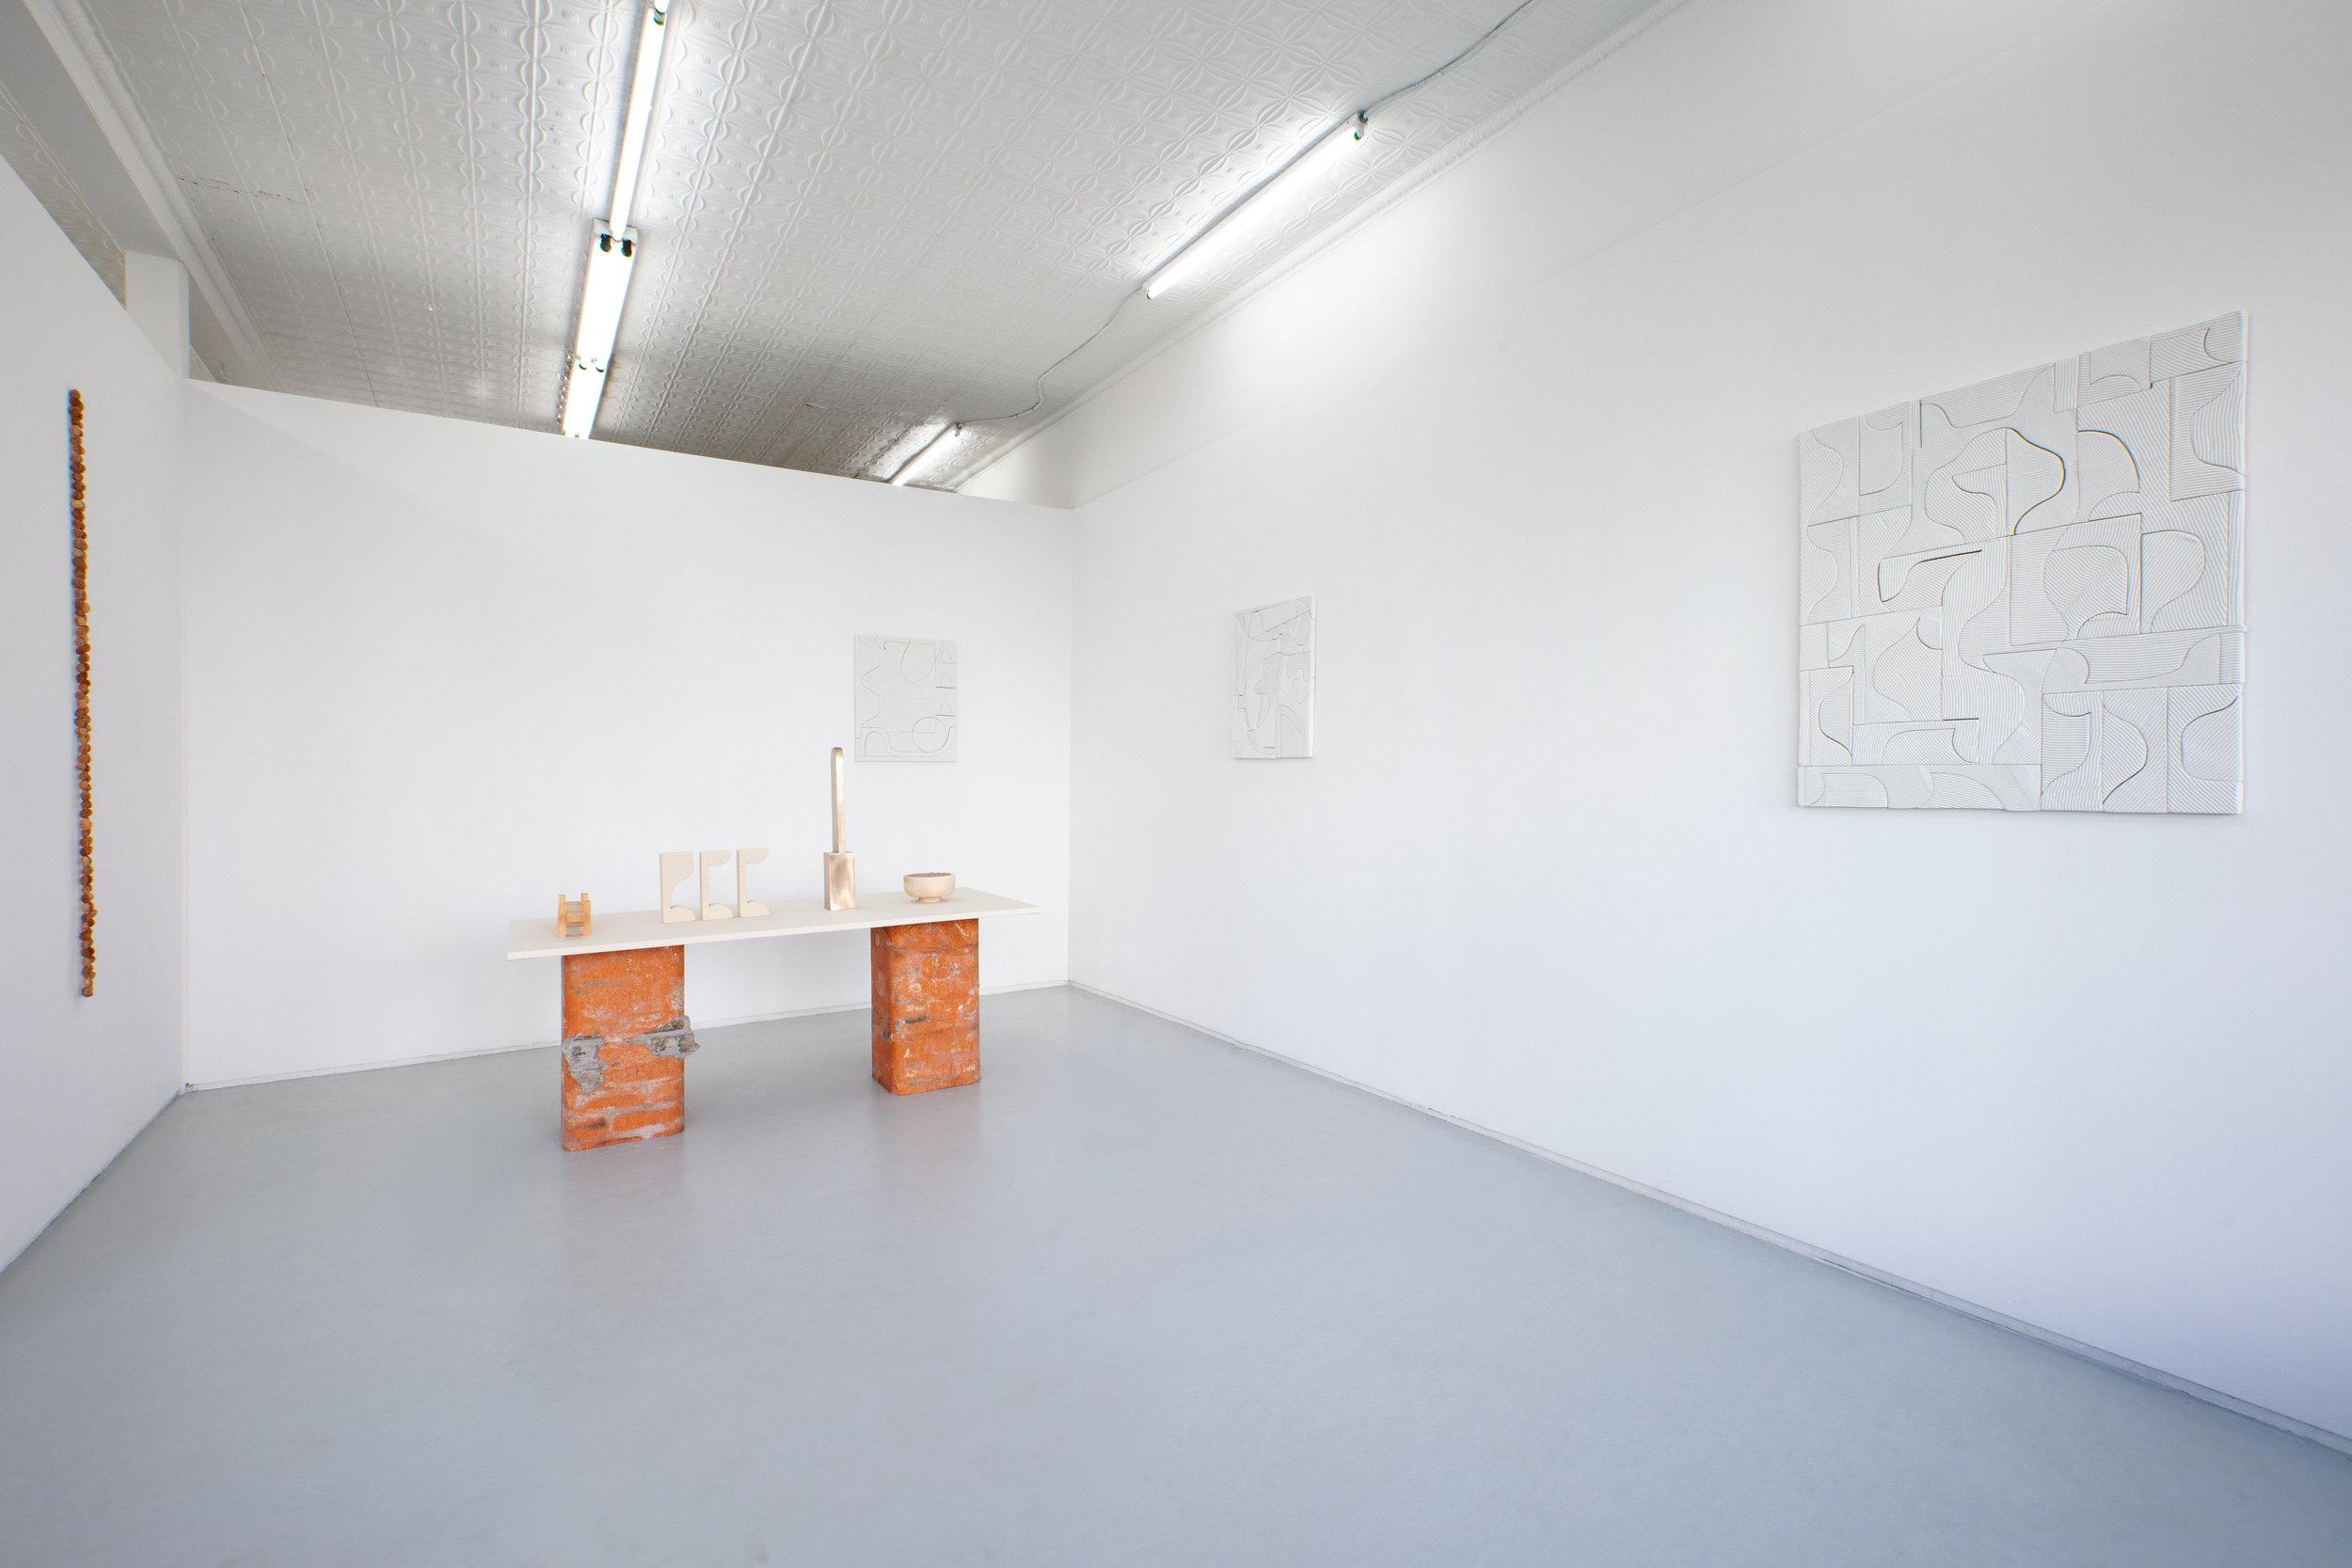 Elizabeth_Atterbury-Night_Comes_In-Installation_View_017.jpg